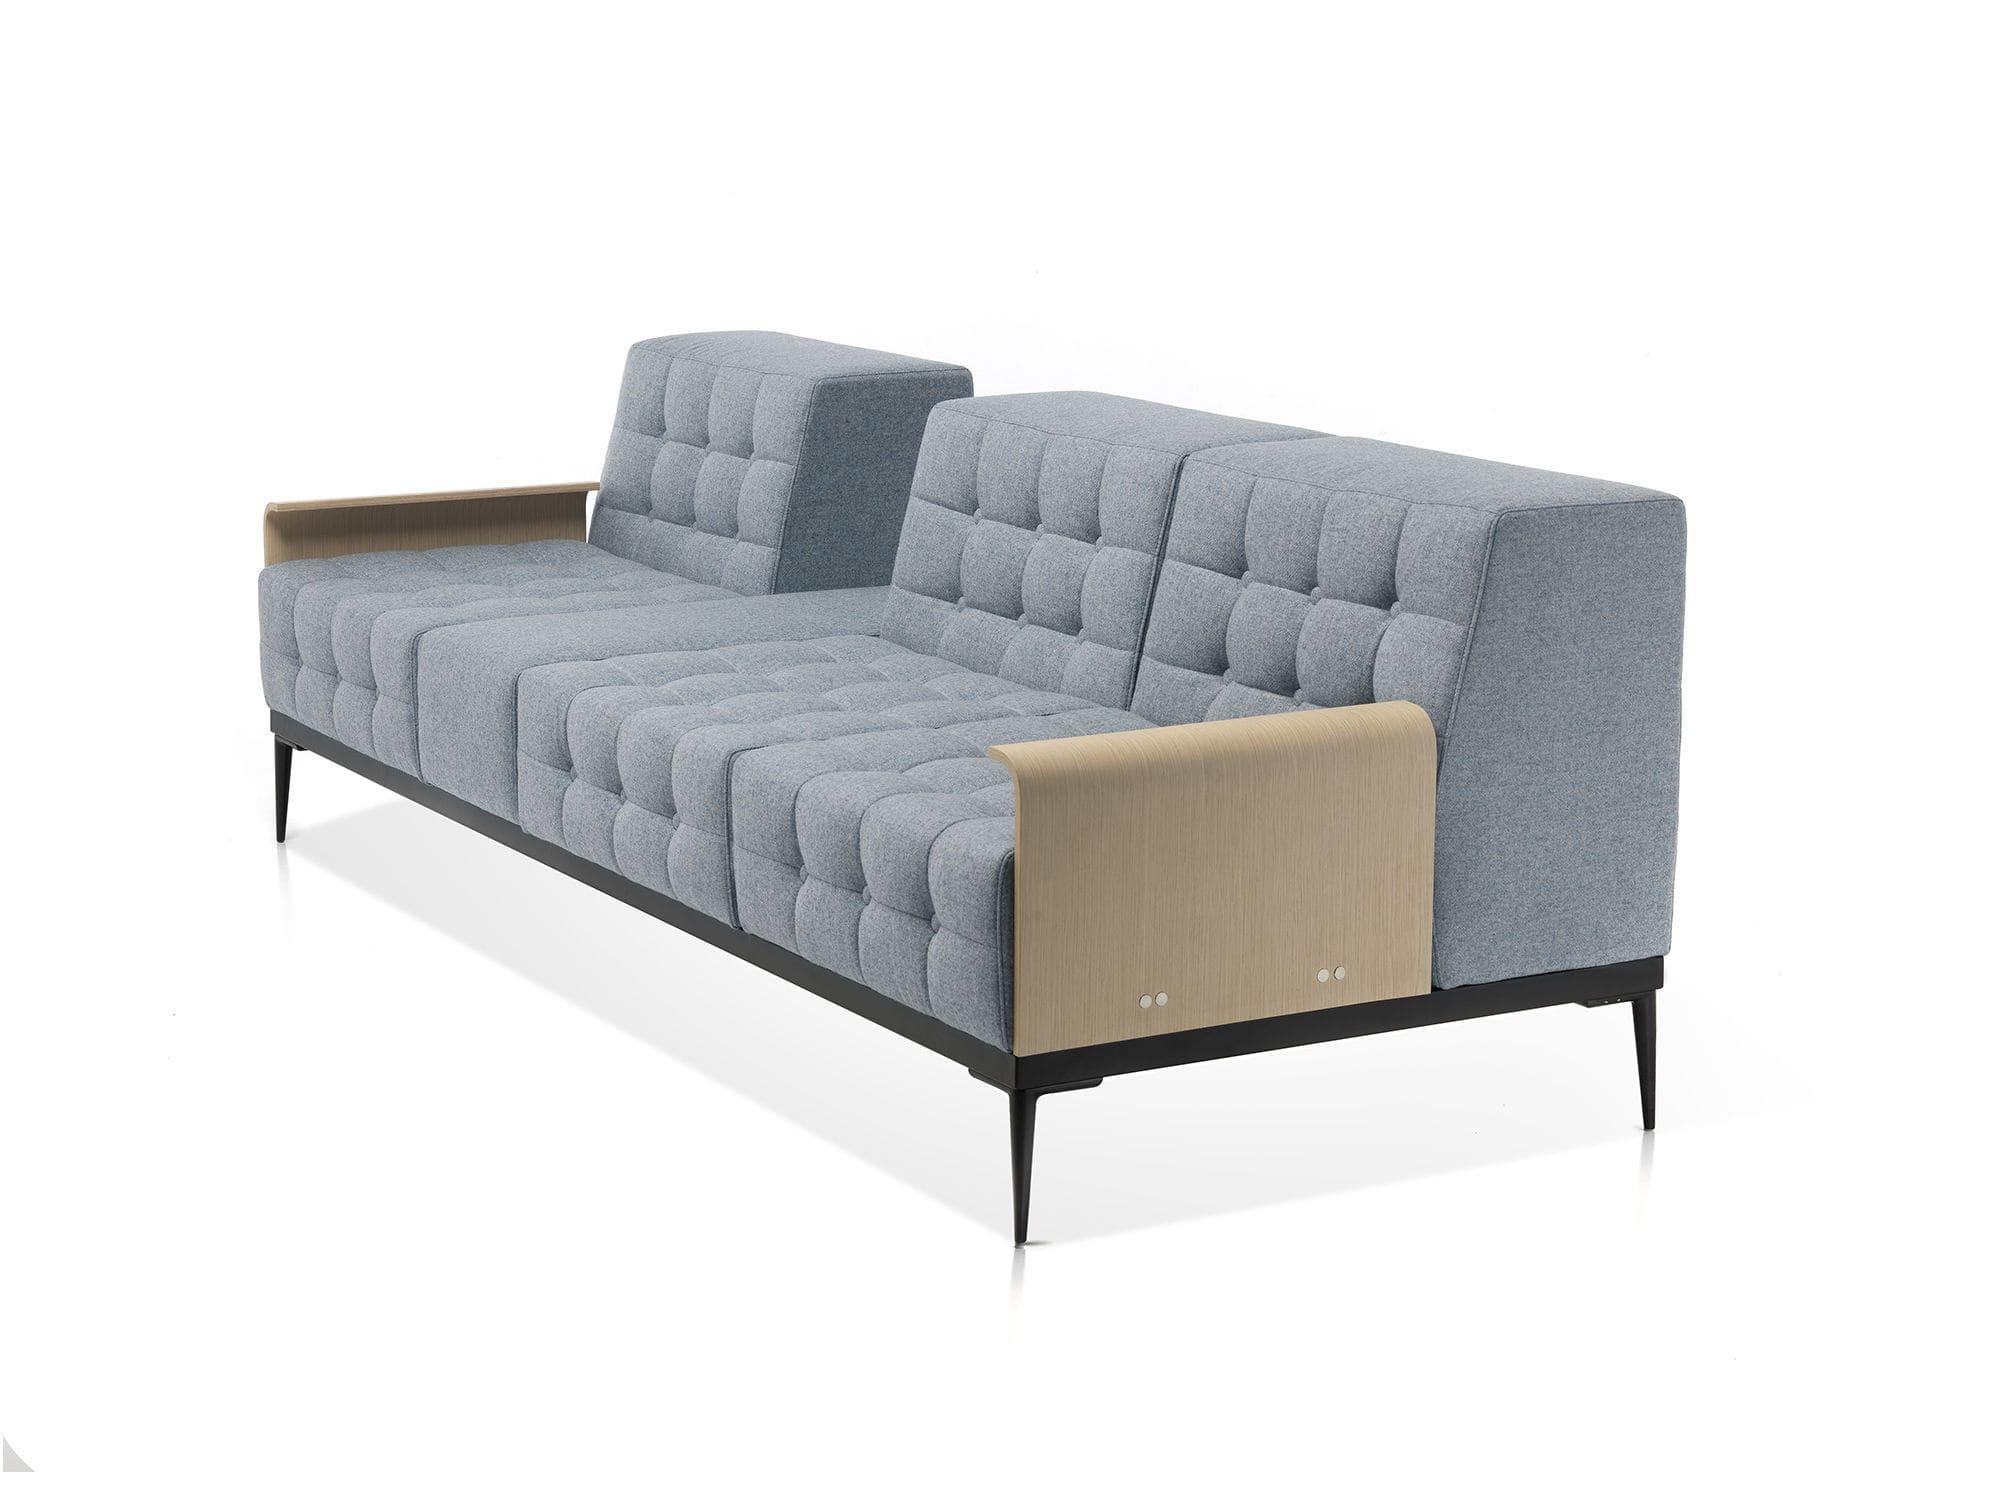 Contemporary sofa / fabric / metal / commercial - FELICITY ...